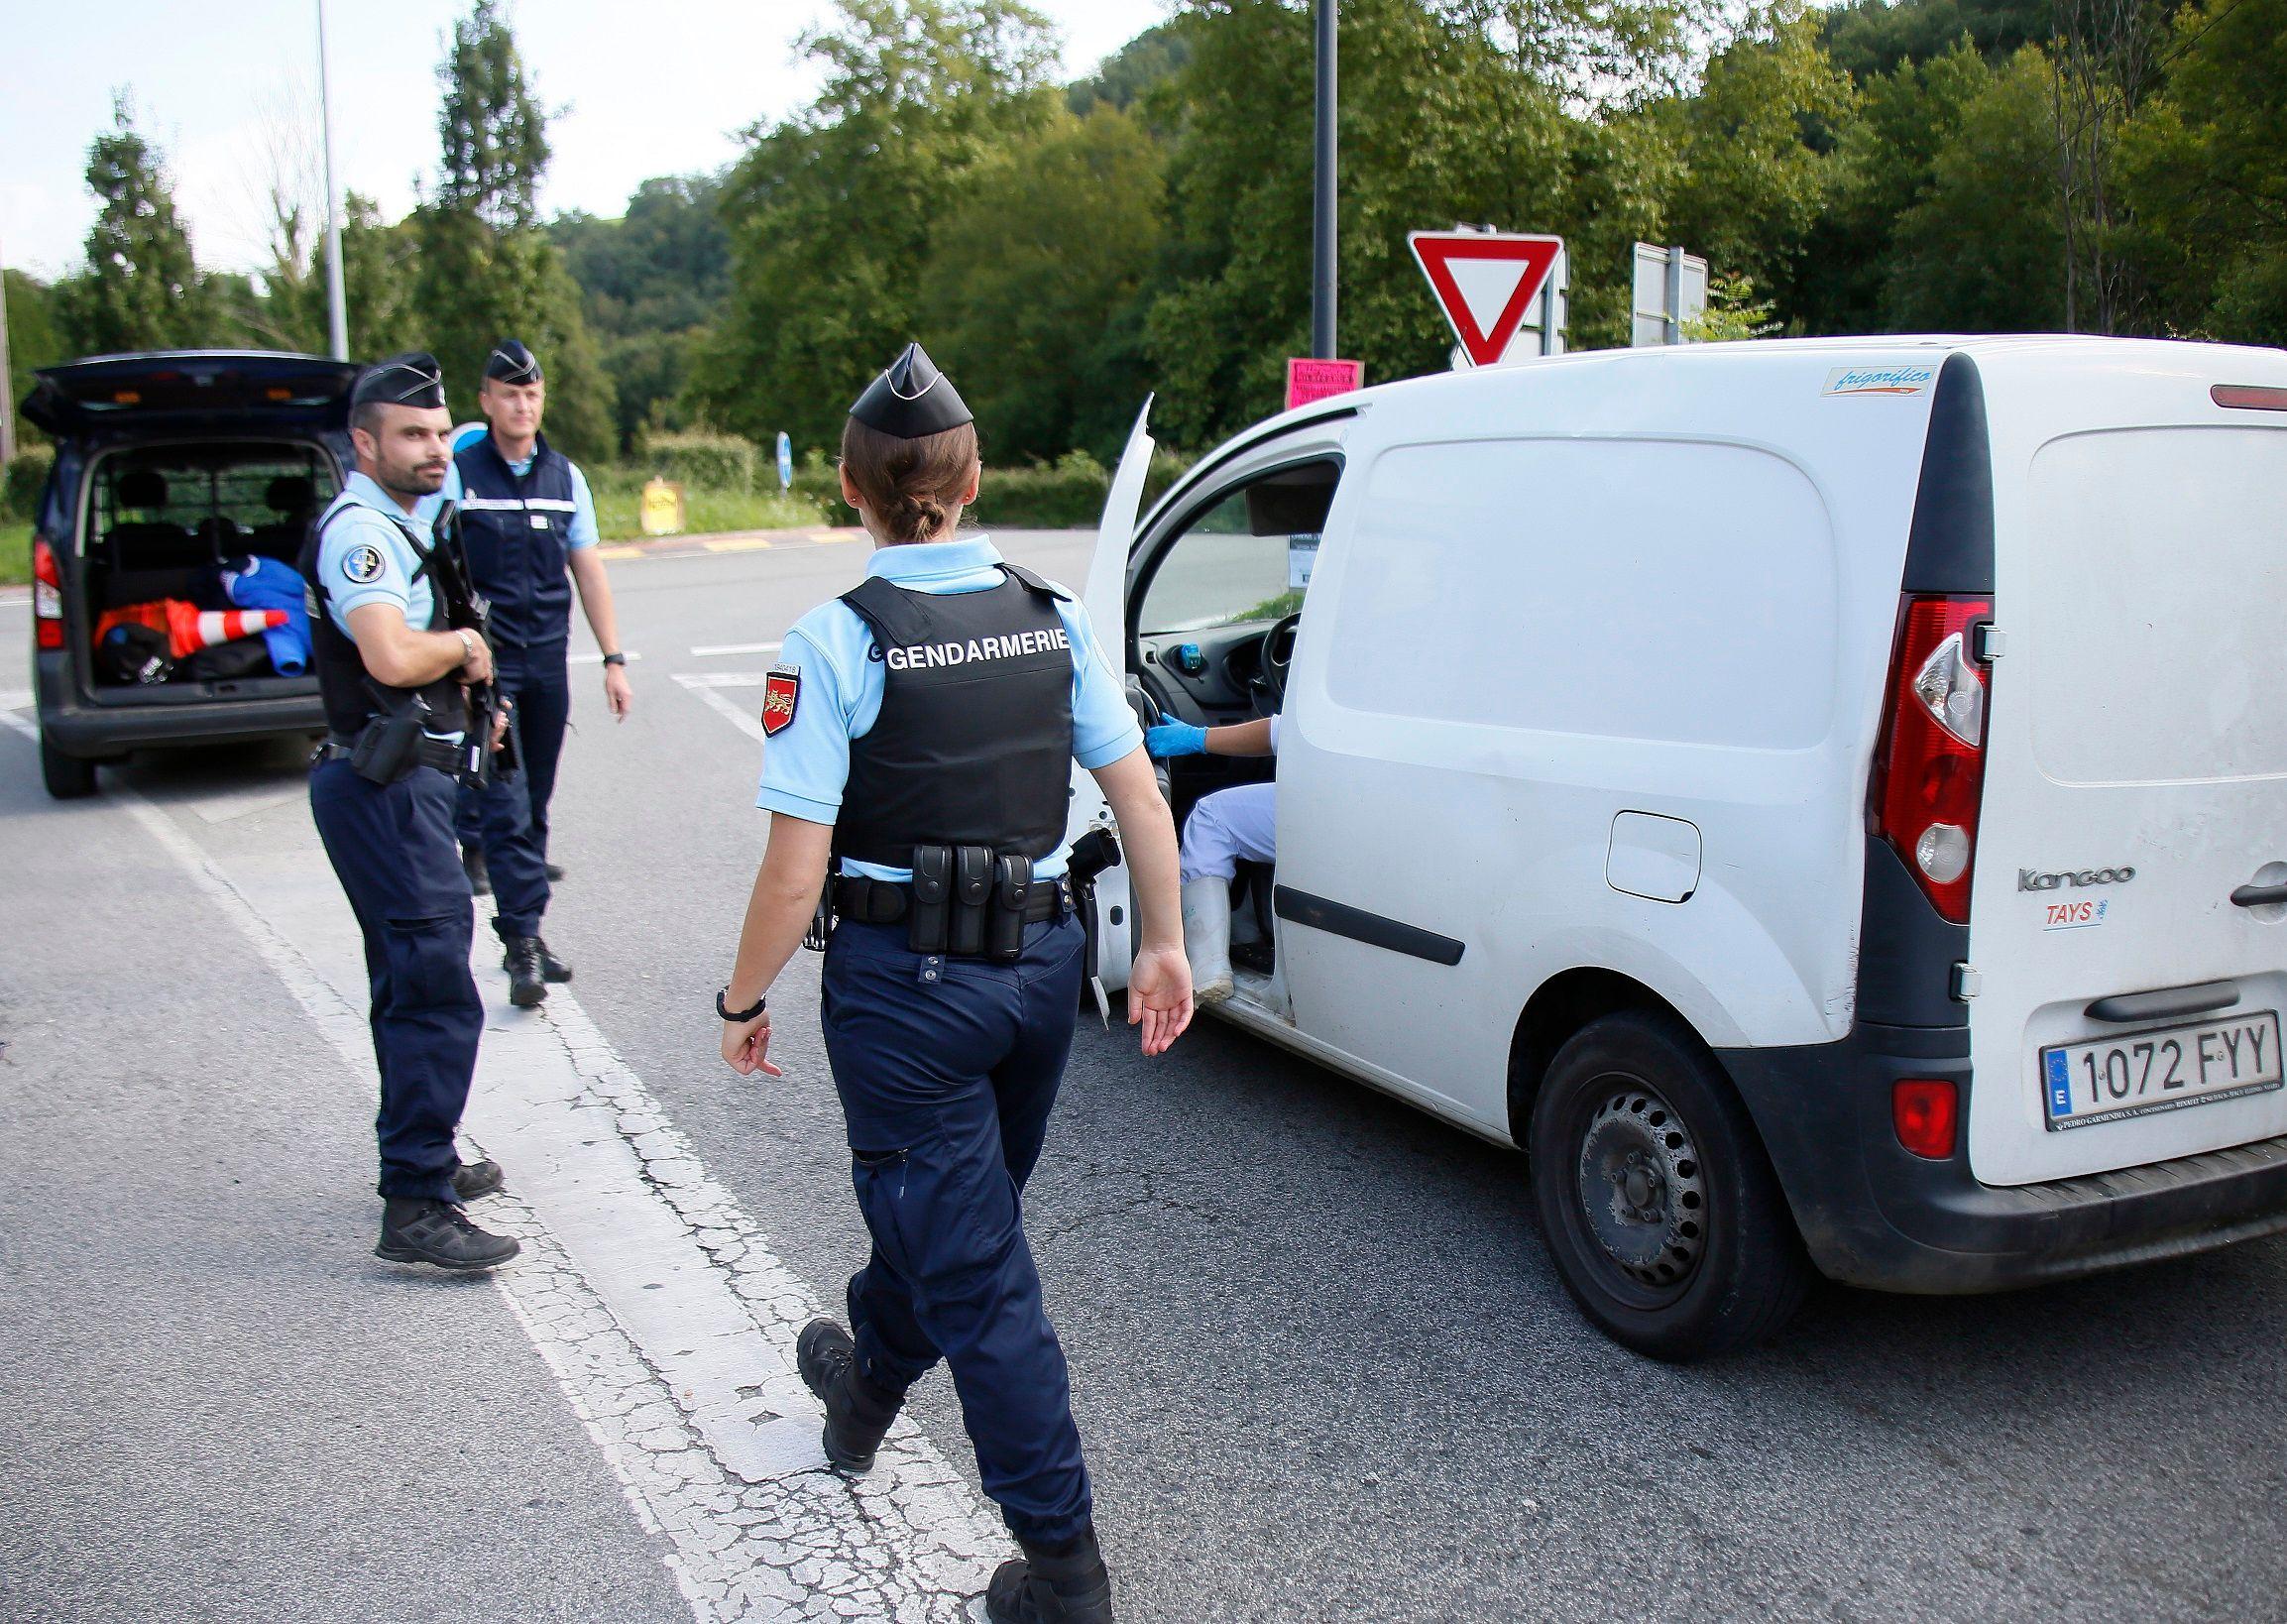 Europe-wide search for 'dangerous' Barcelona van driver